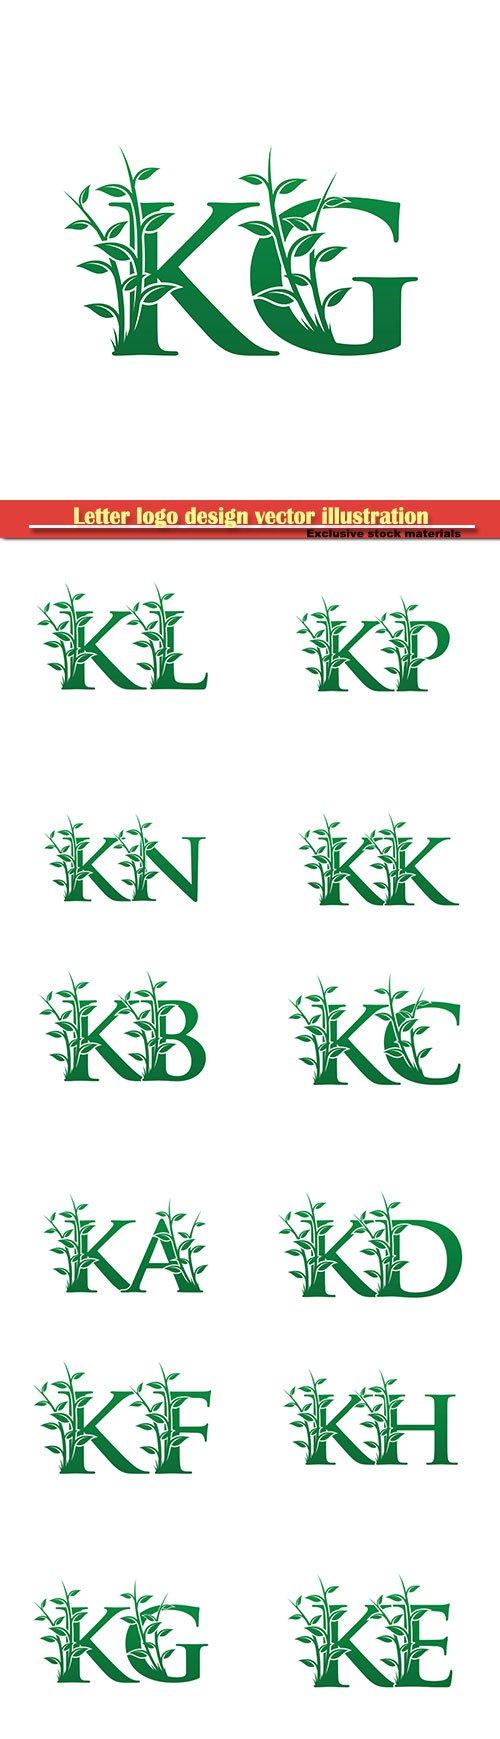 Letter logo design vector illustration template # 23